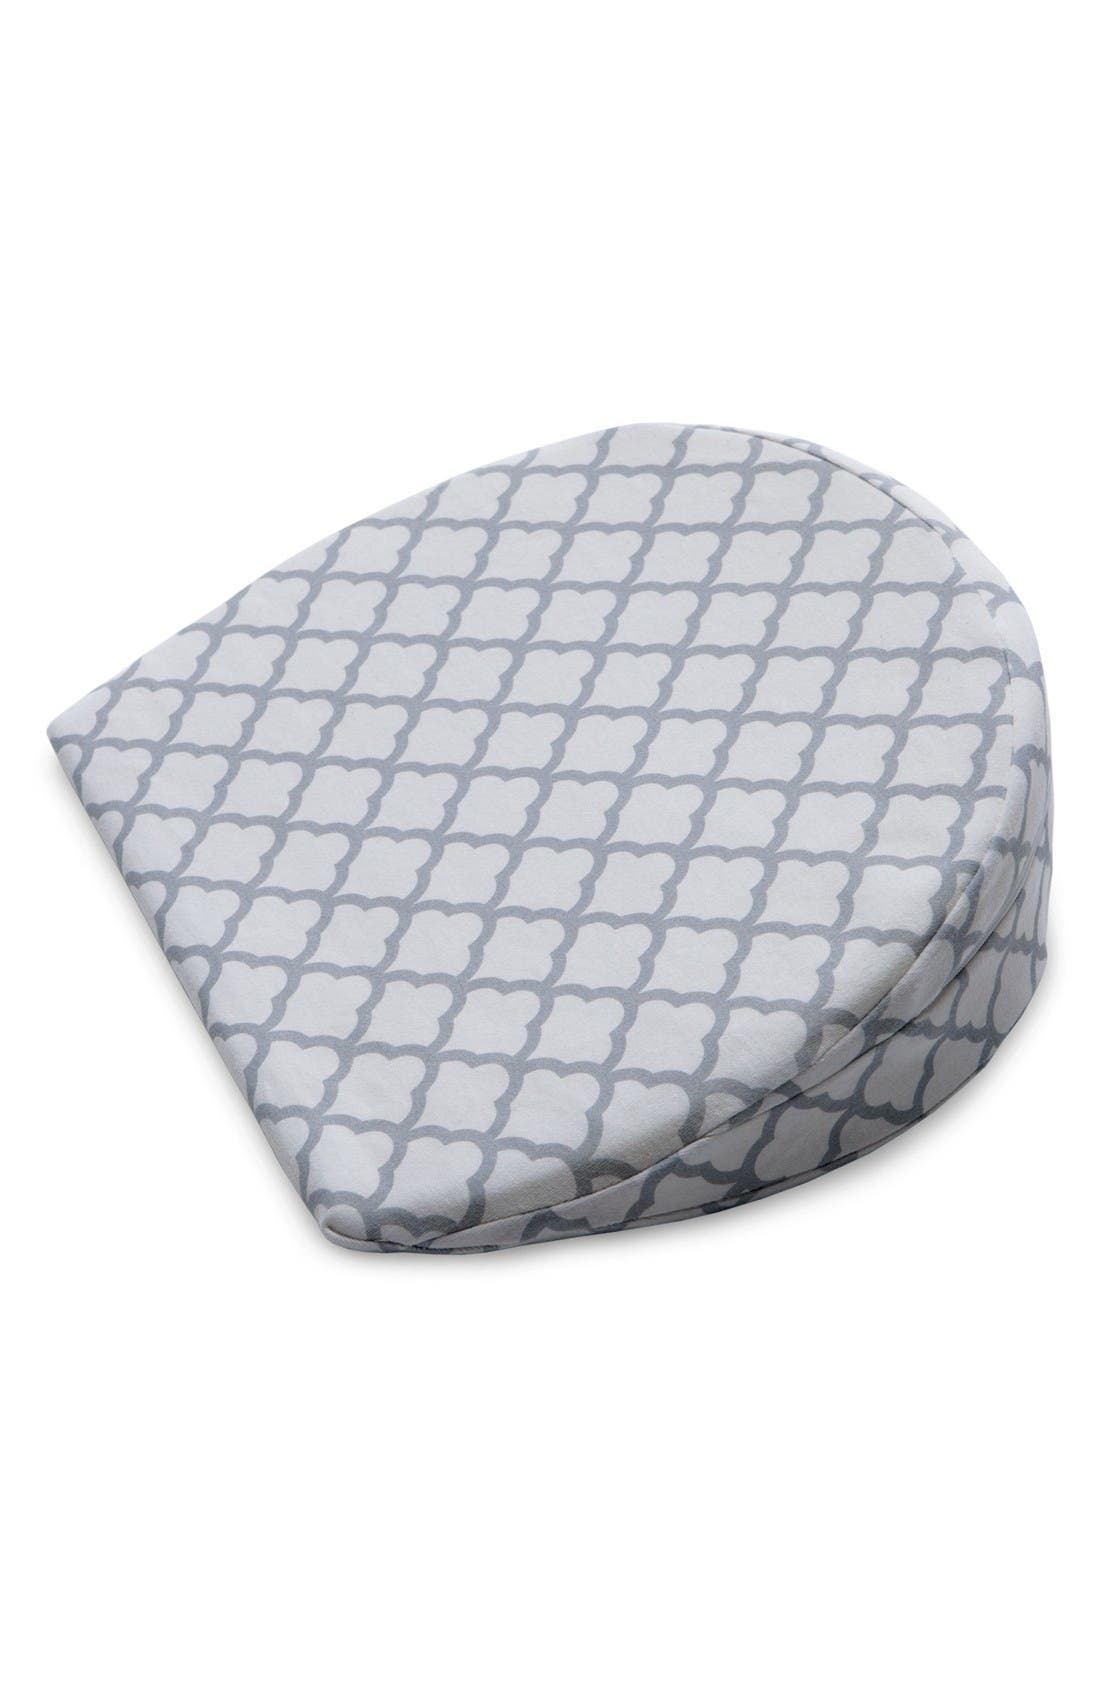 Pregnancy Wedge Cushion & Slipcover,                         Main,                         color, White Trellis